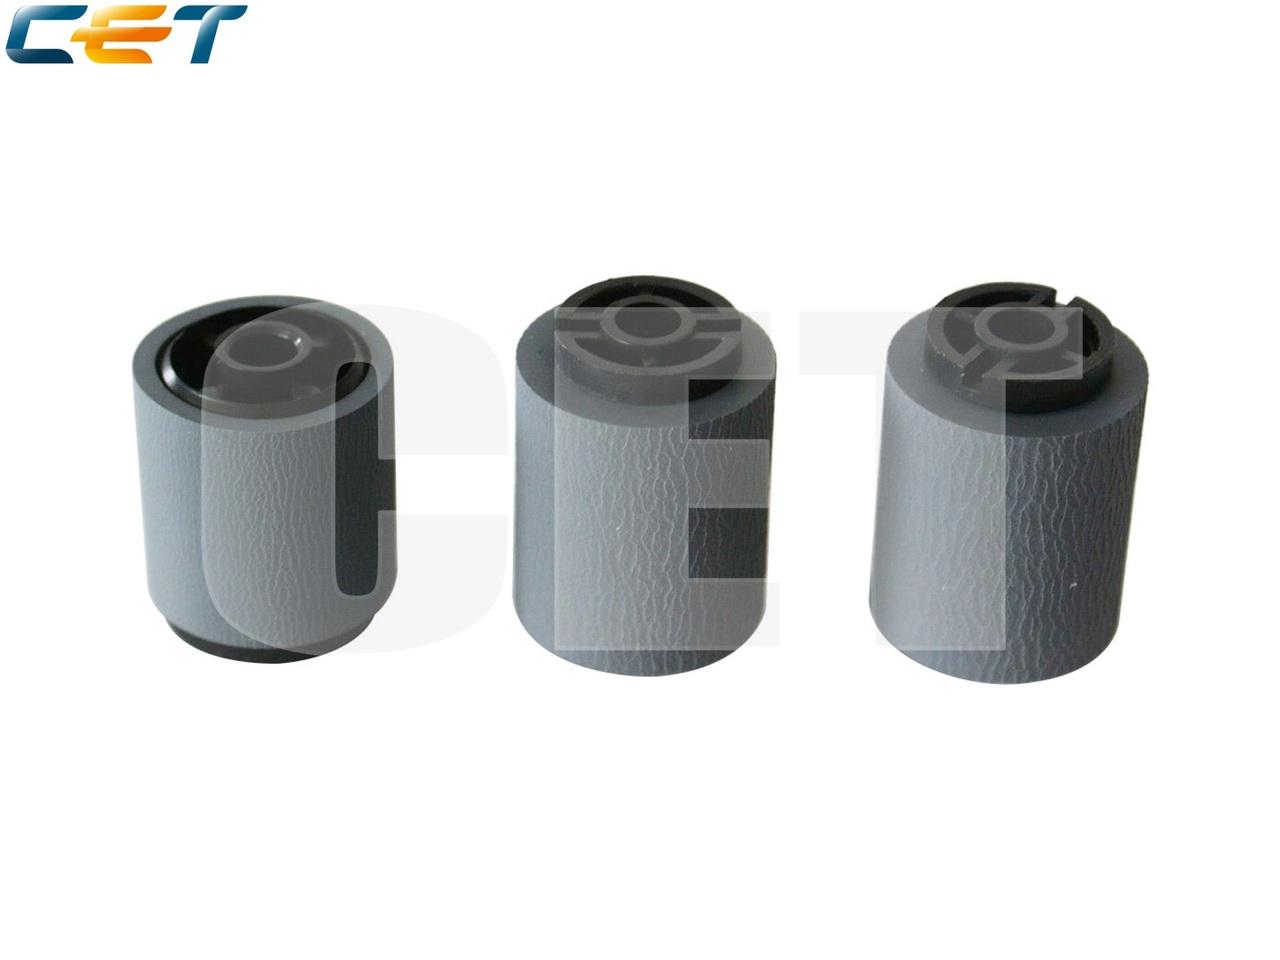 Комплект роликов 6LA04047000 (2 шт.), 6LA04042000 (1 шт.)для TOSHIBA E-Studio 550/650/810 (CET), CET8377